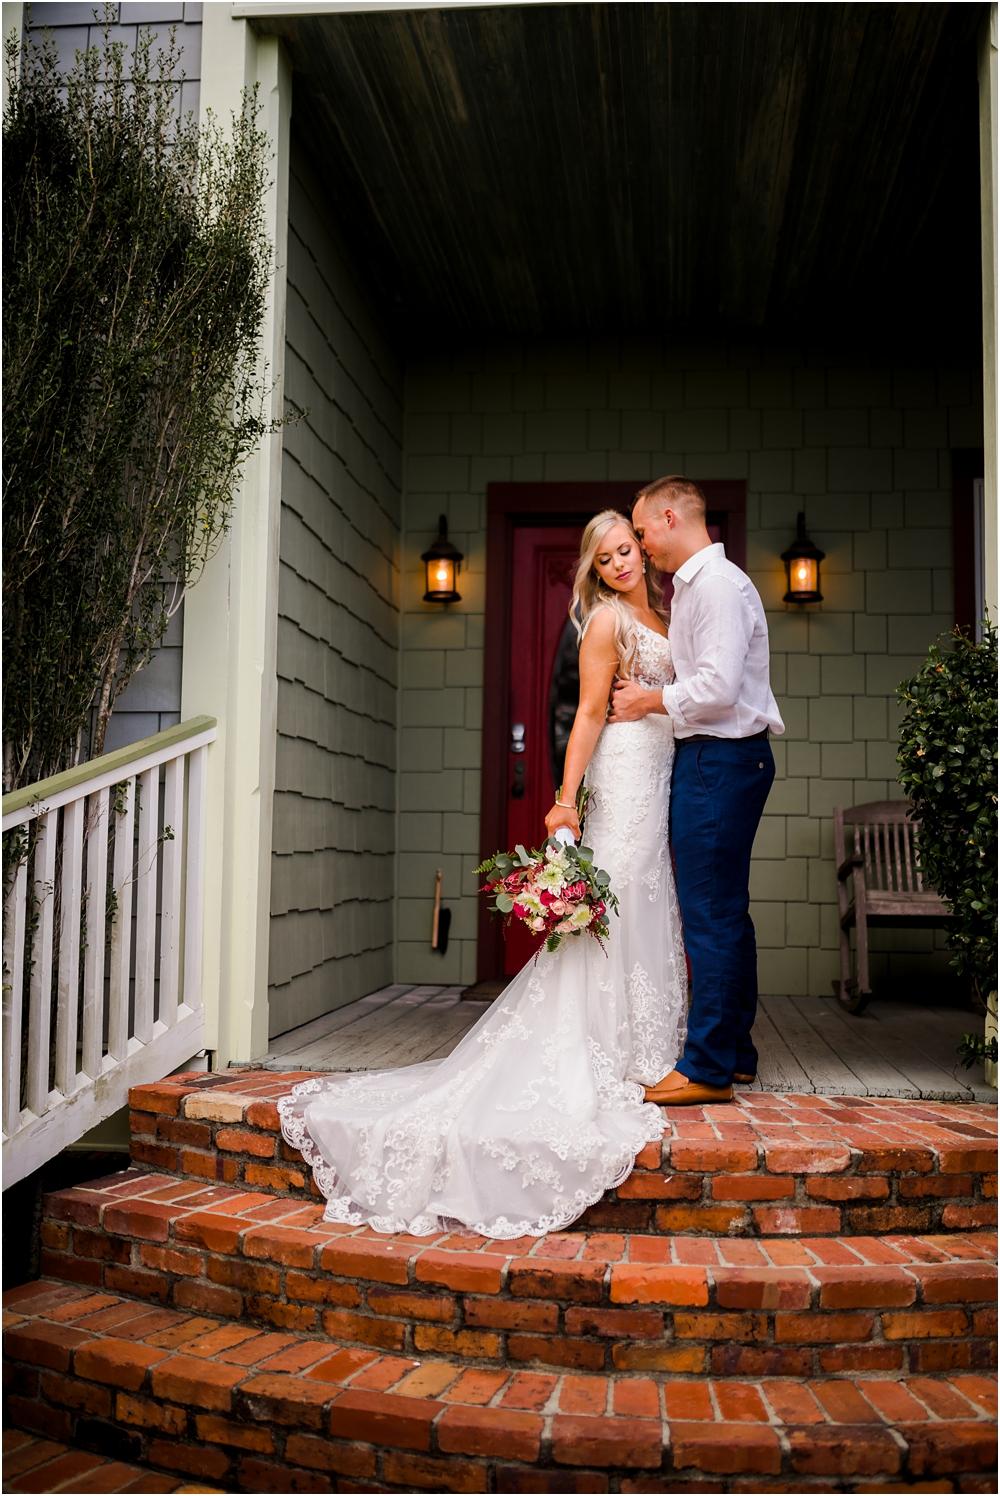 mcglothlin-wedding-kiersten-stevenson-photography-30a-panama-city-beach-dothan-tallahassee-(54-of-145).jpg